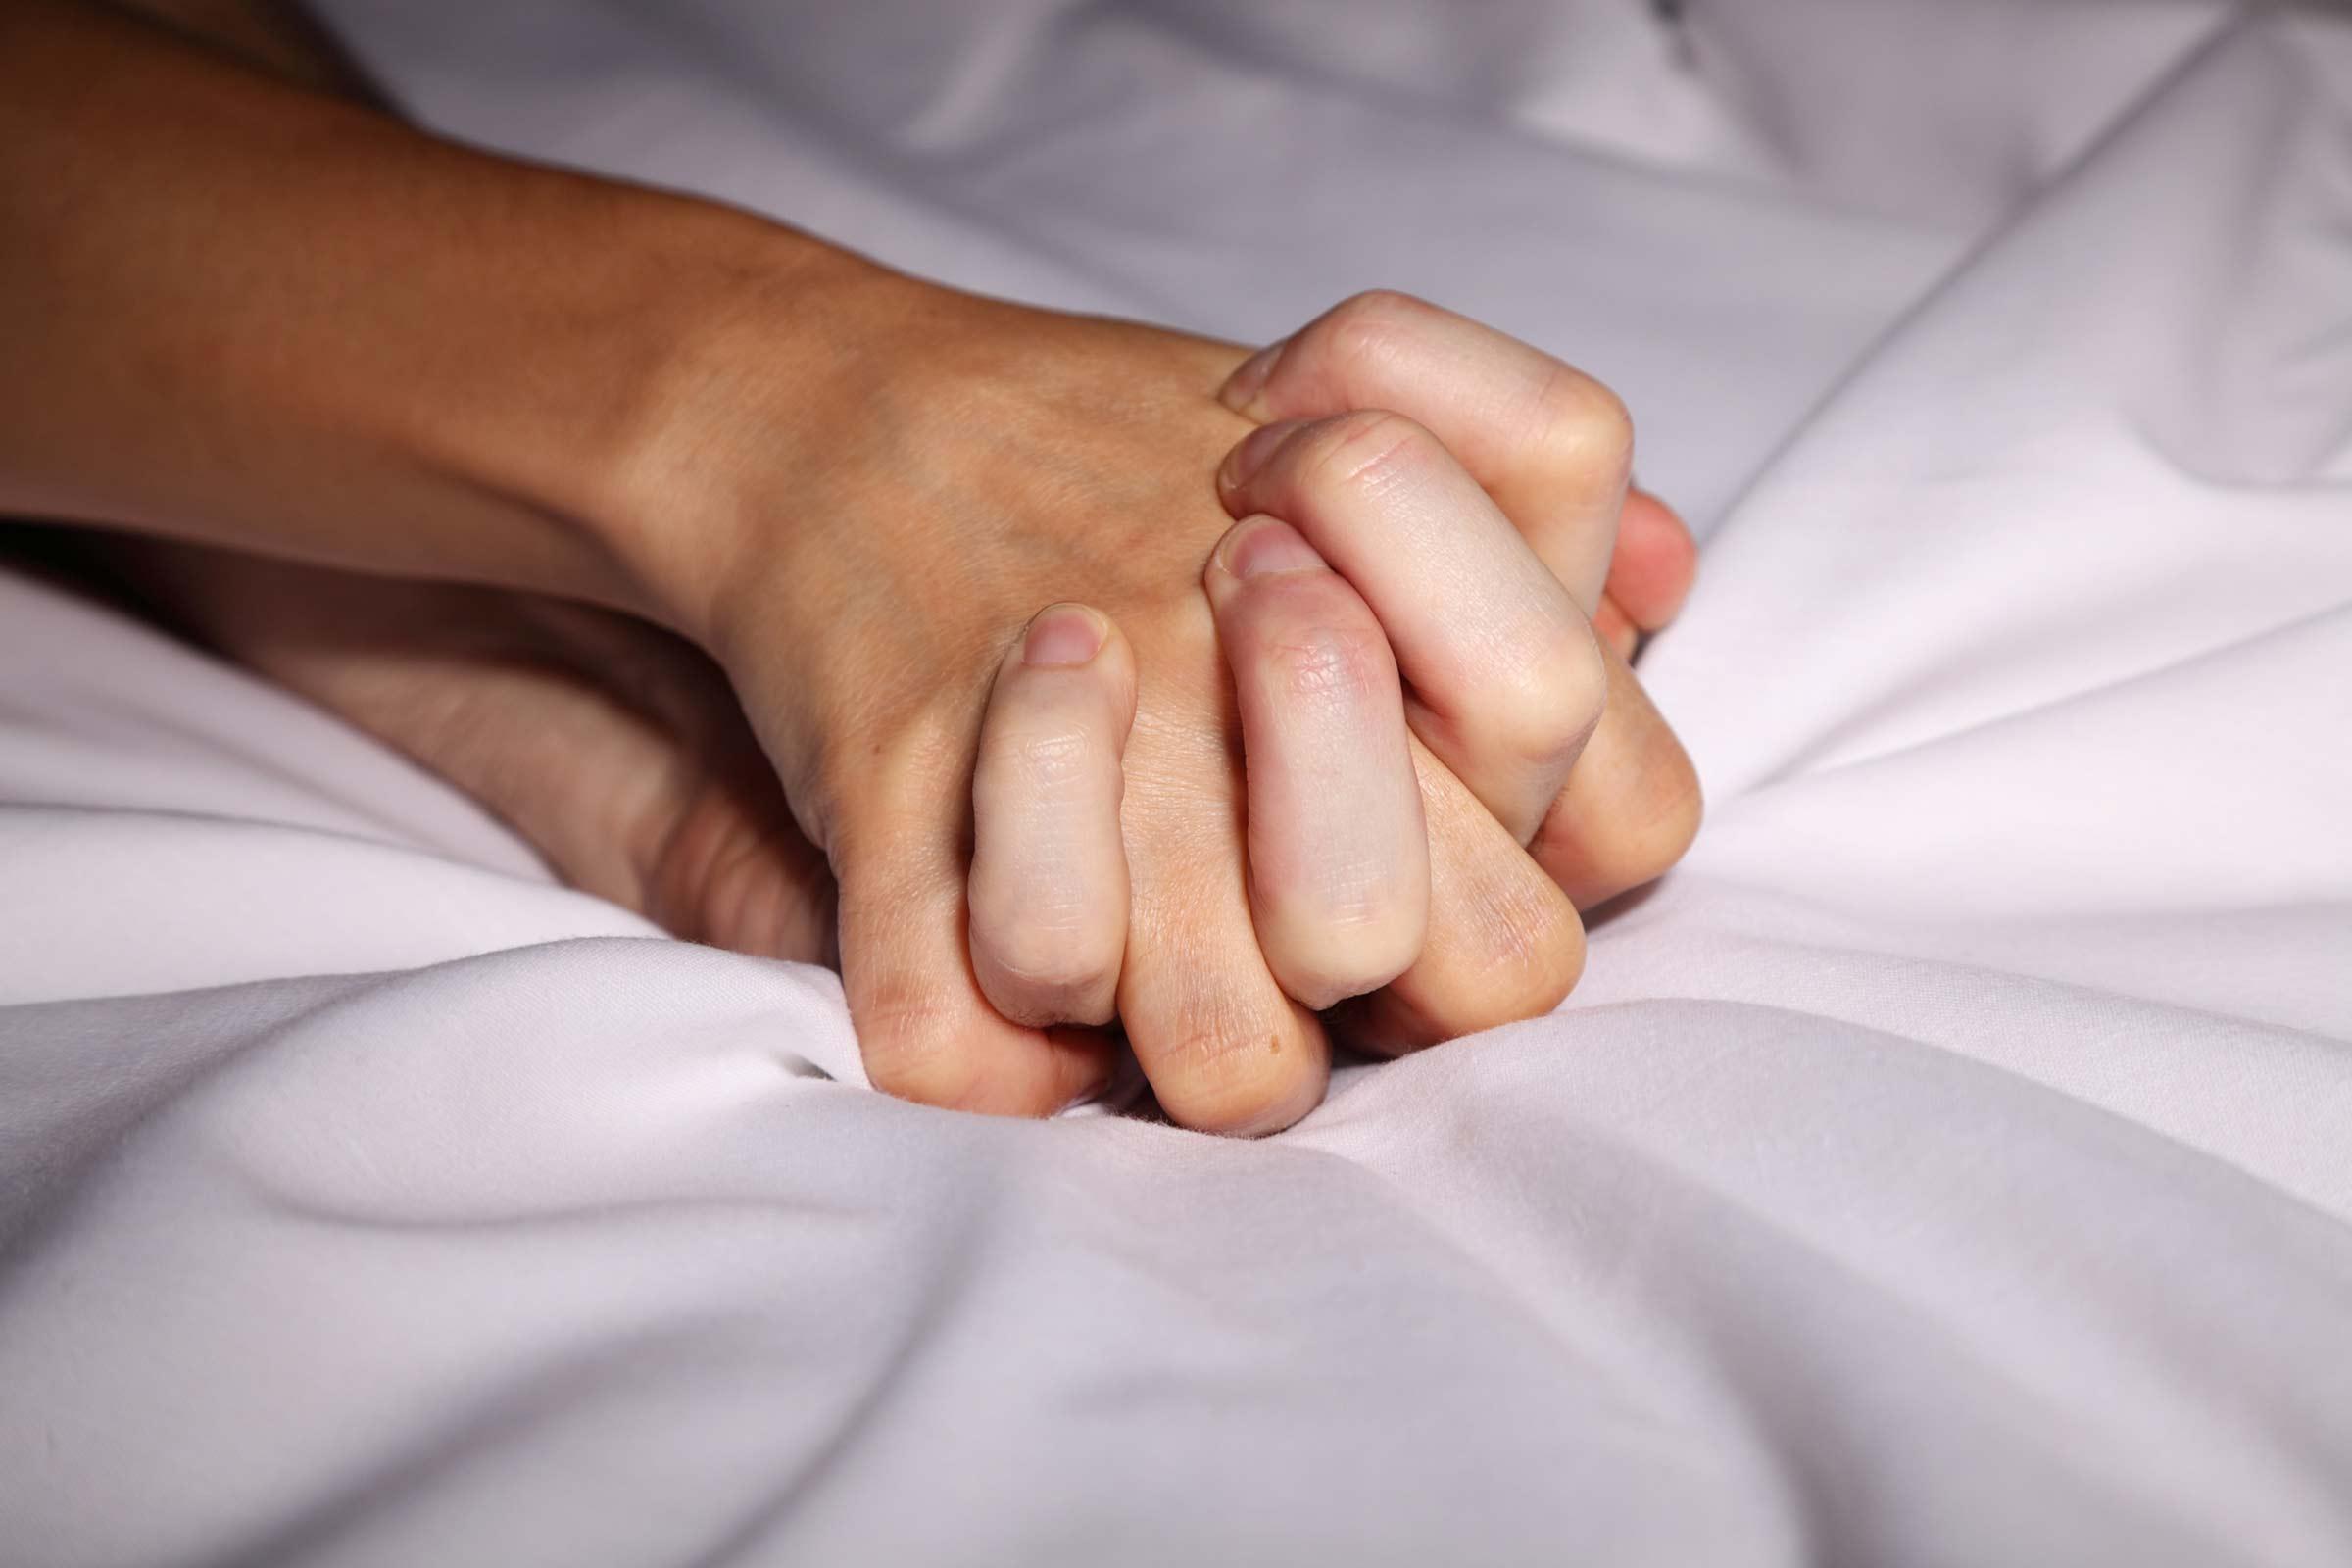 03-want-reasons-movie-sex-ruining-sex-life-528684117-Sadeugra